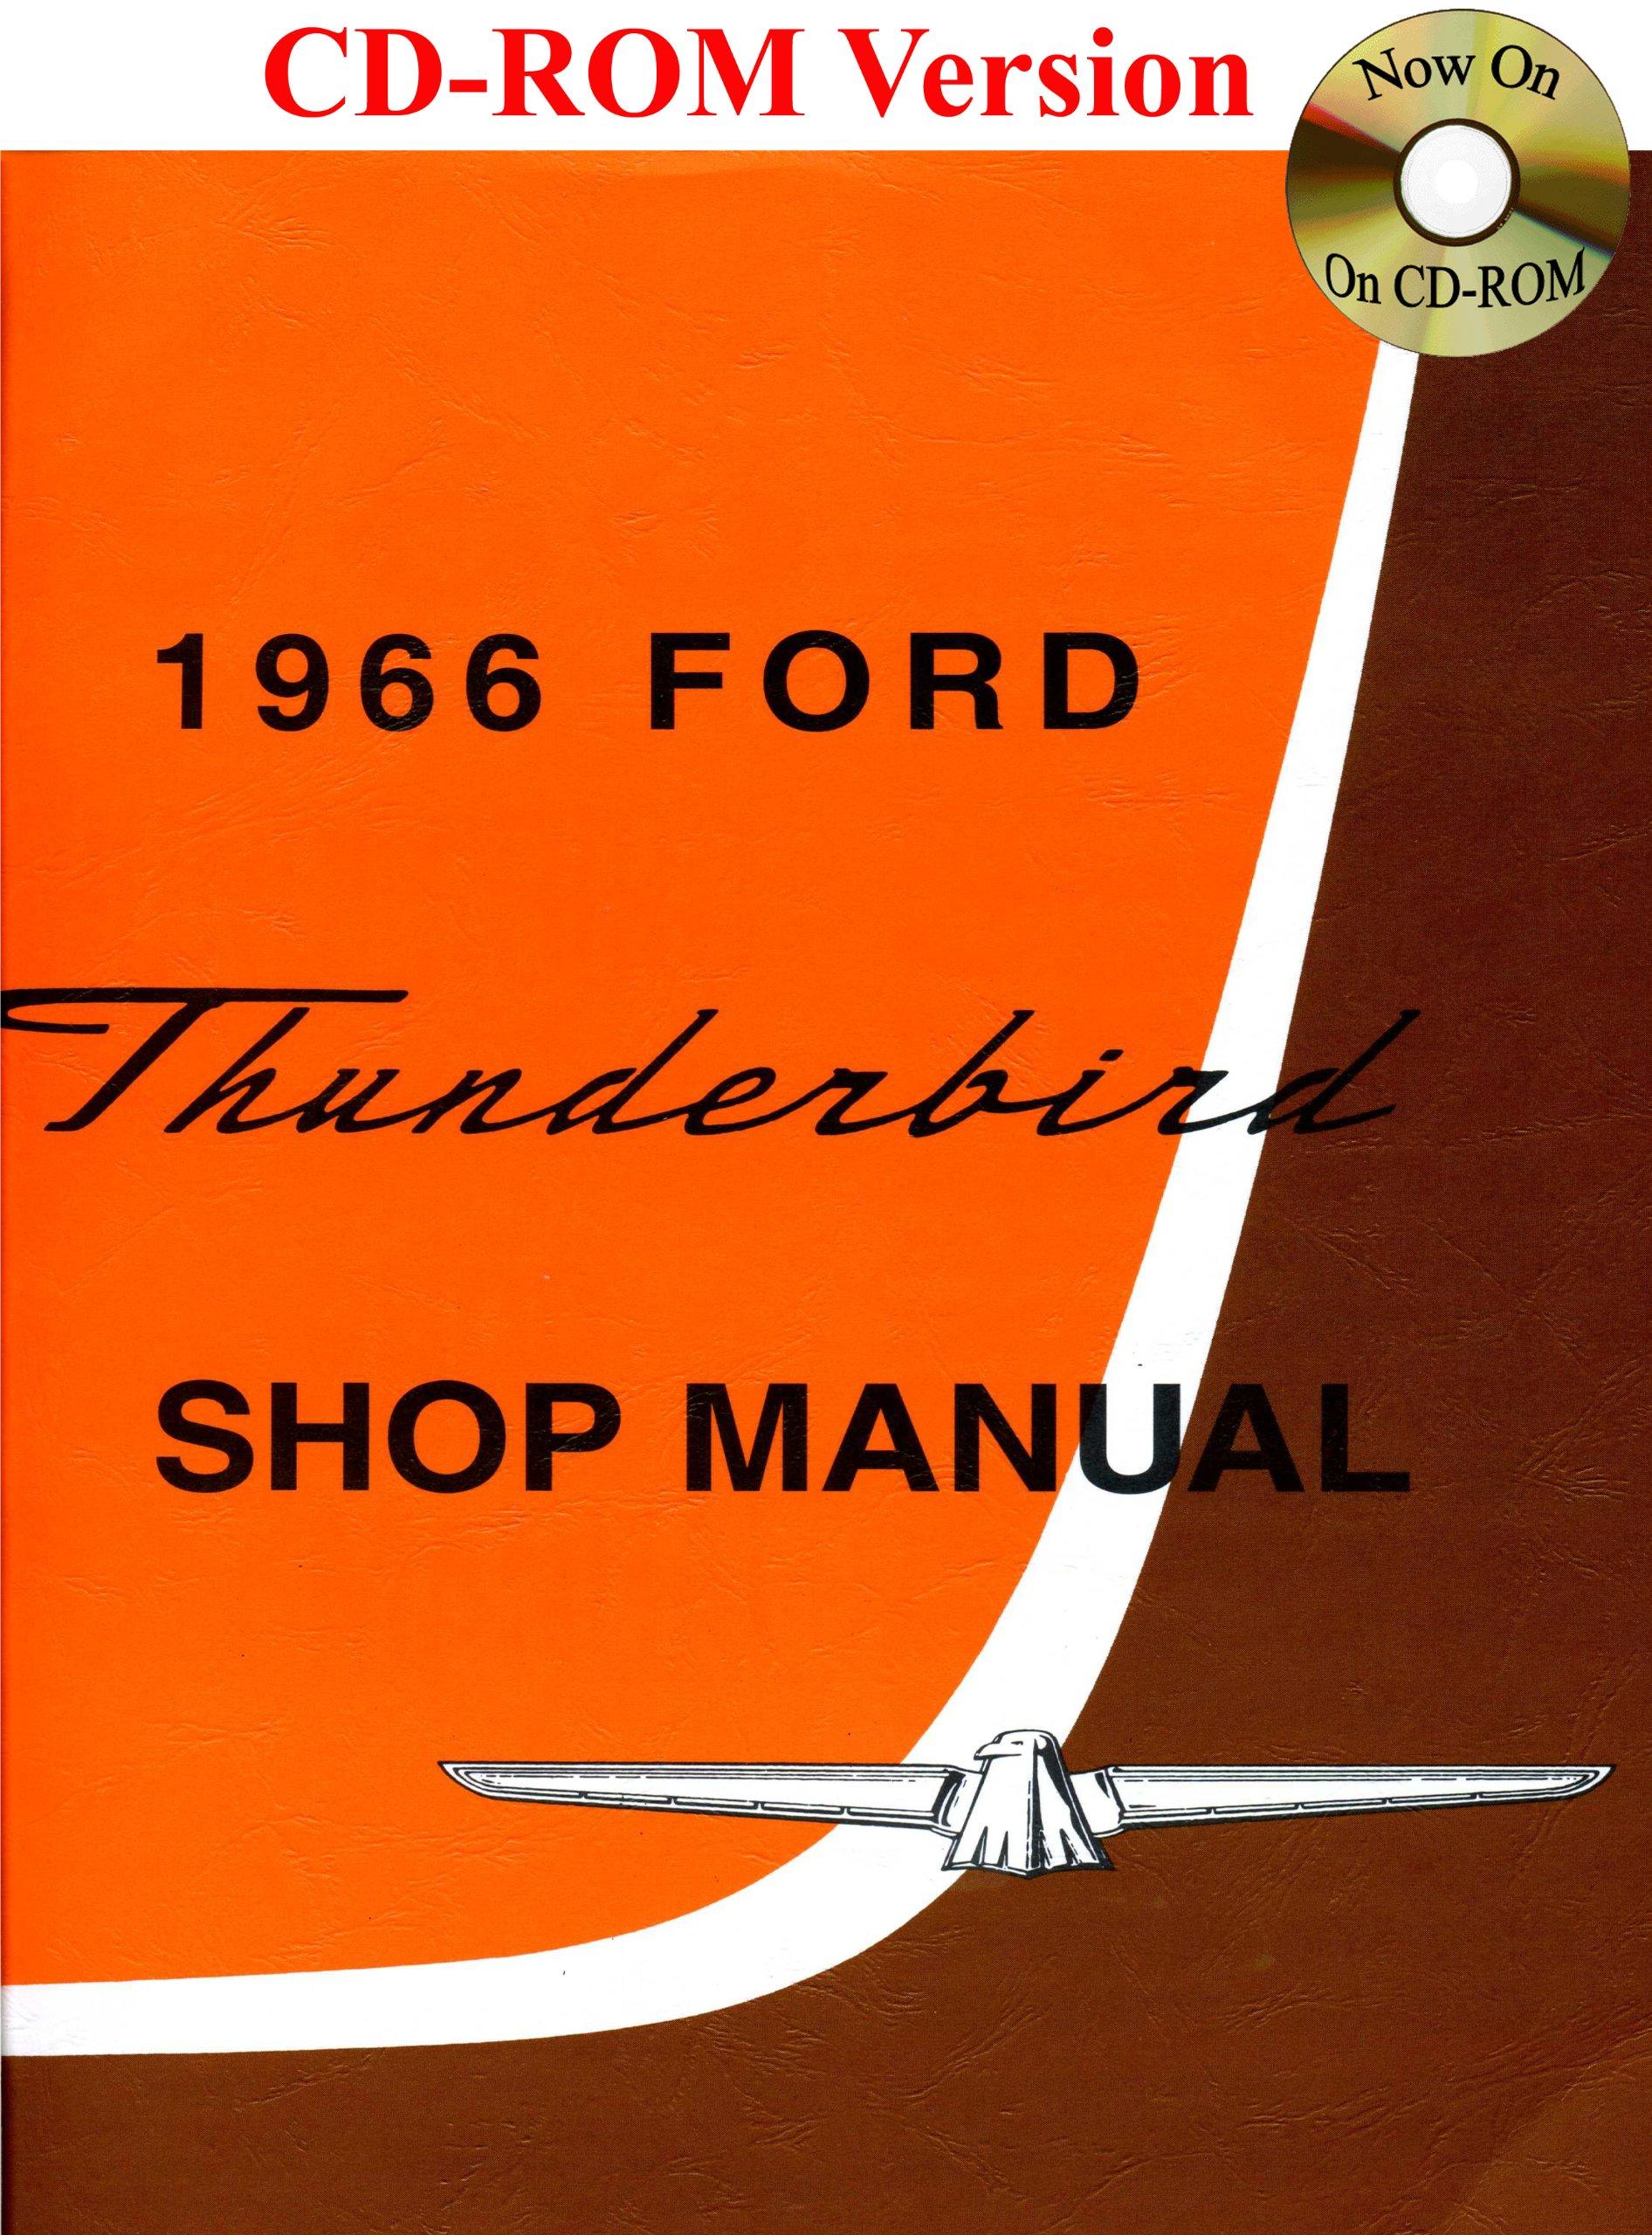 1966 Ford Thunderbird Shop Manual: Ford Motor Company, David E. LeBlanc:  9781603710169: Amazon.com: Books